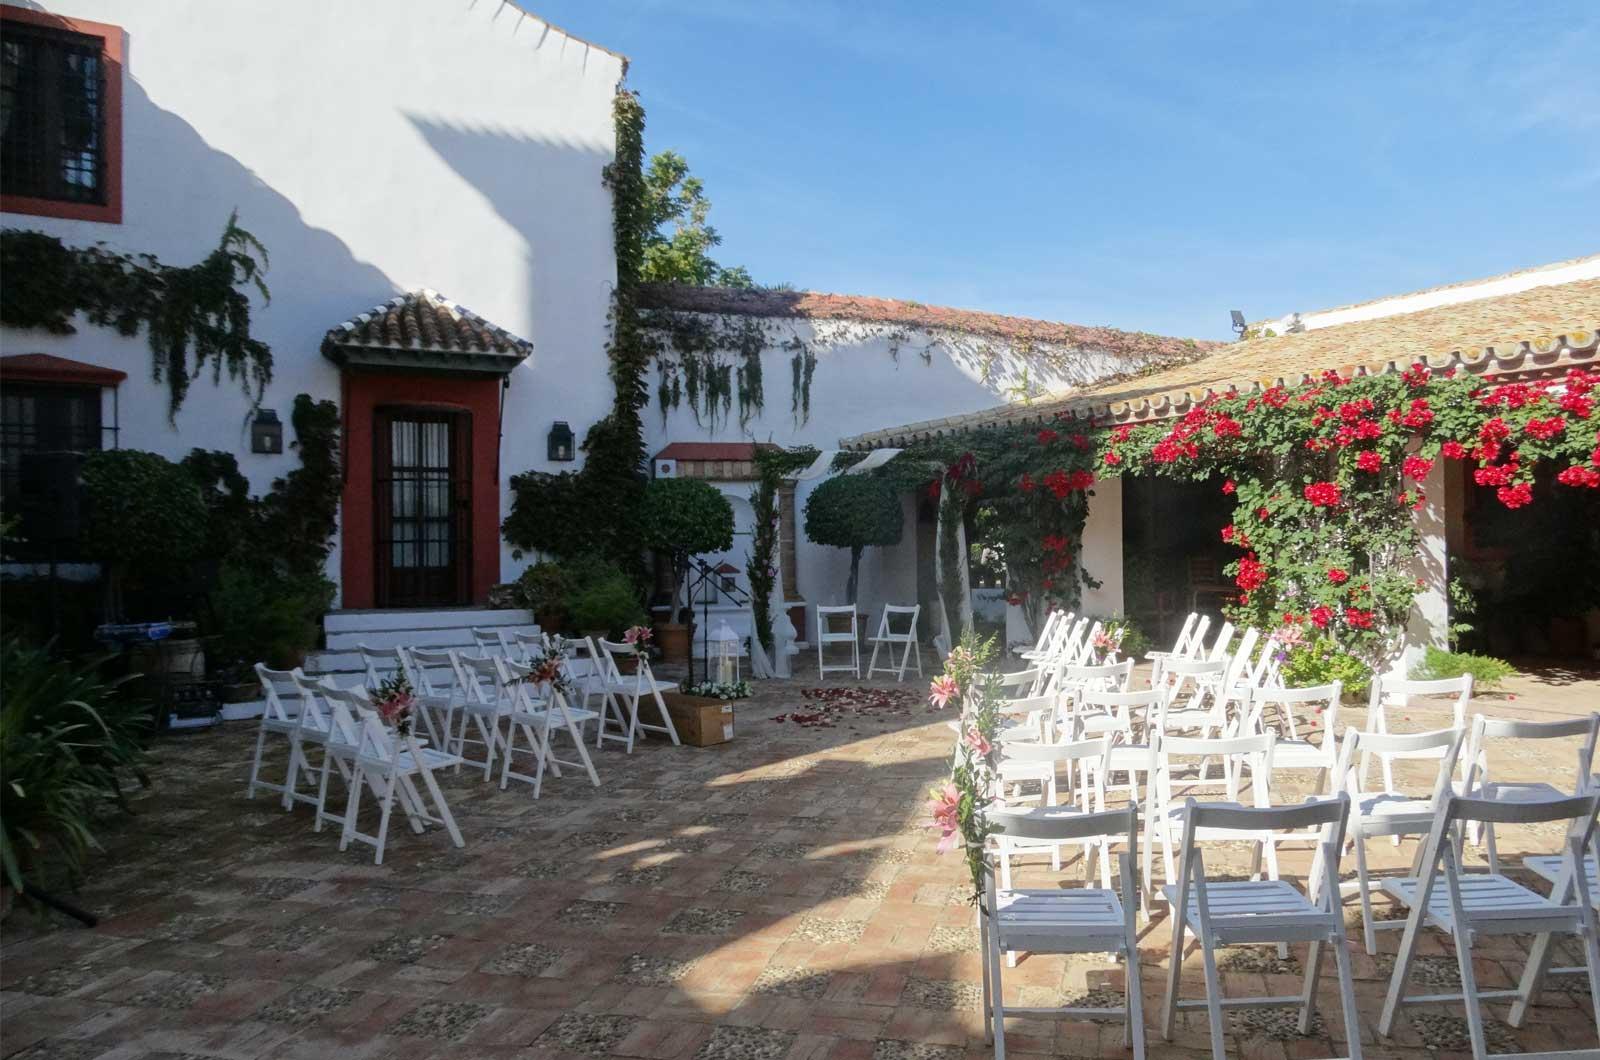 Hacienda ORÁN -Mesas patio<div style='clear:both;width:100%;height:0px;'></div><span class='cat'>Hacienda Orán</span><div style='clear:both;width:100%;height:0px;'></div><span class='desc'>Hacienda ORÁN -Mesas patio</span>